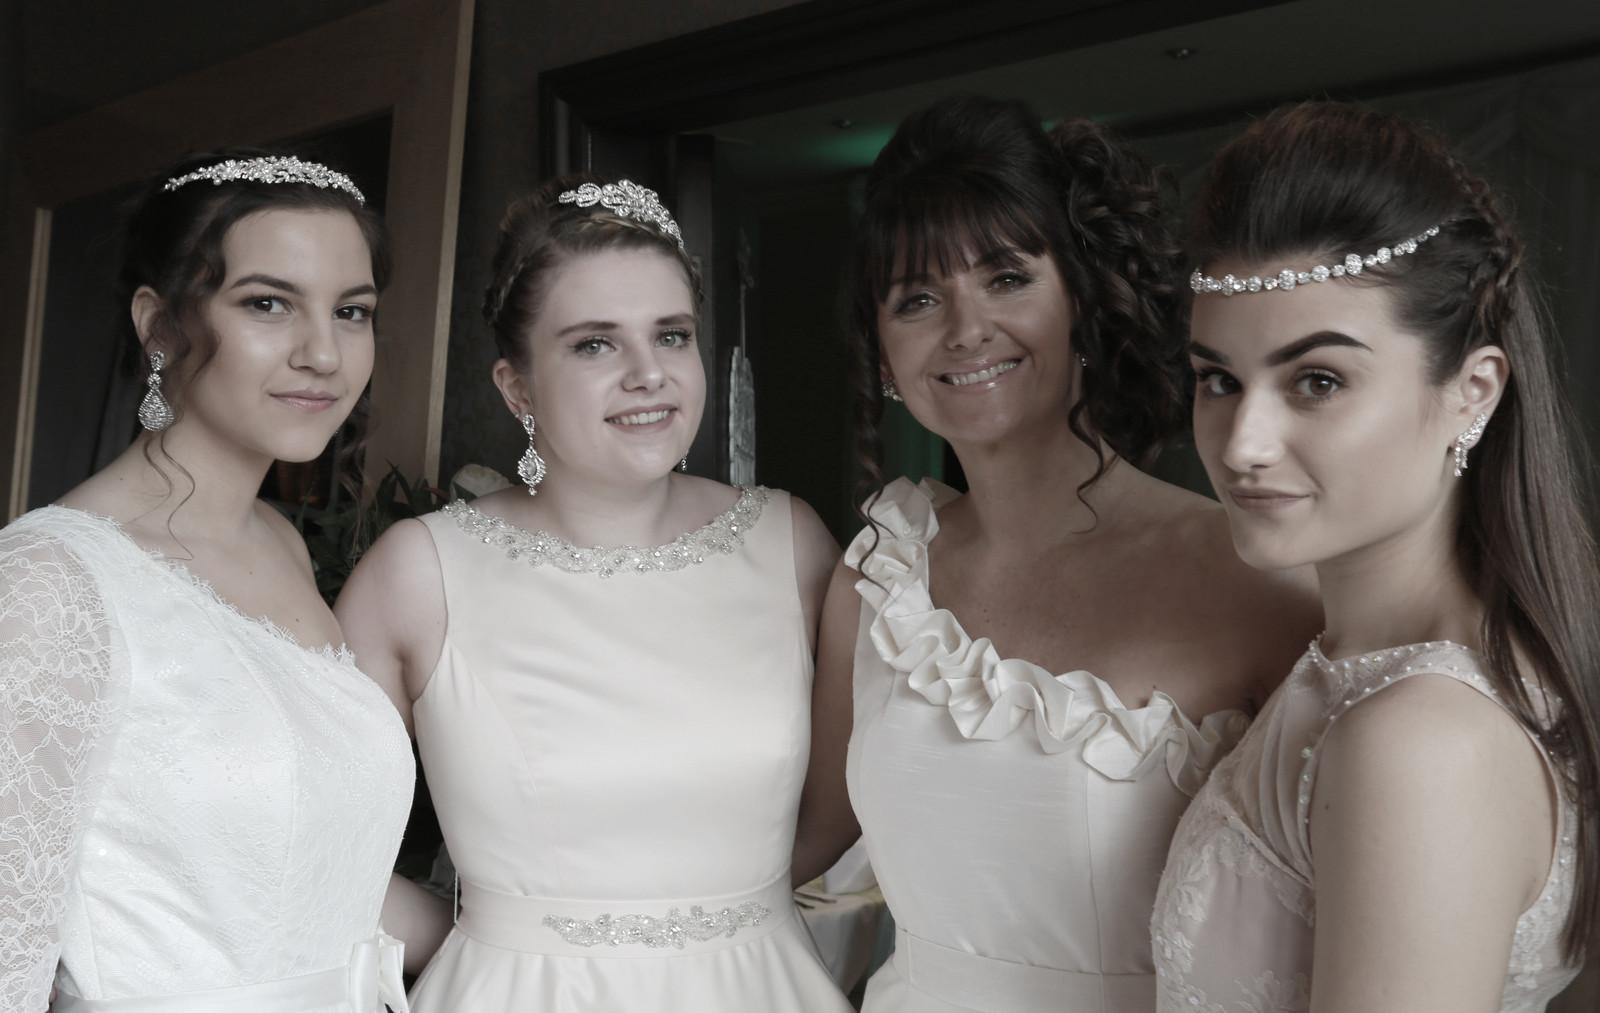 Made to Measure wedding dresses | Mayflower Bridal Shop, Southampton ...